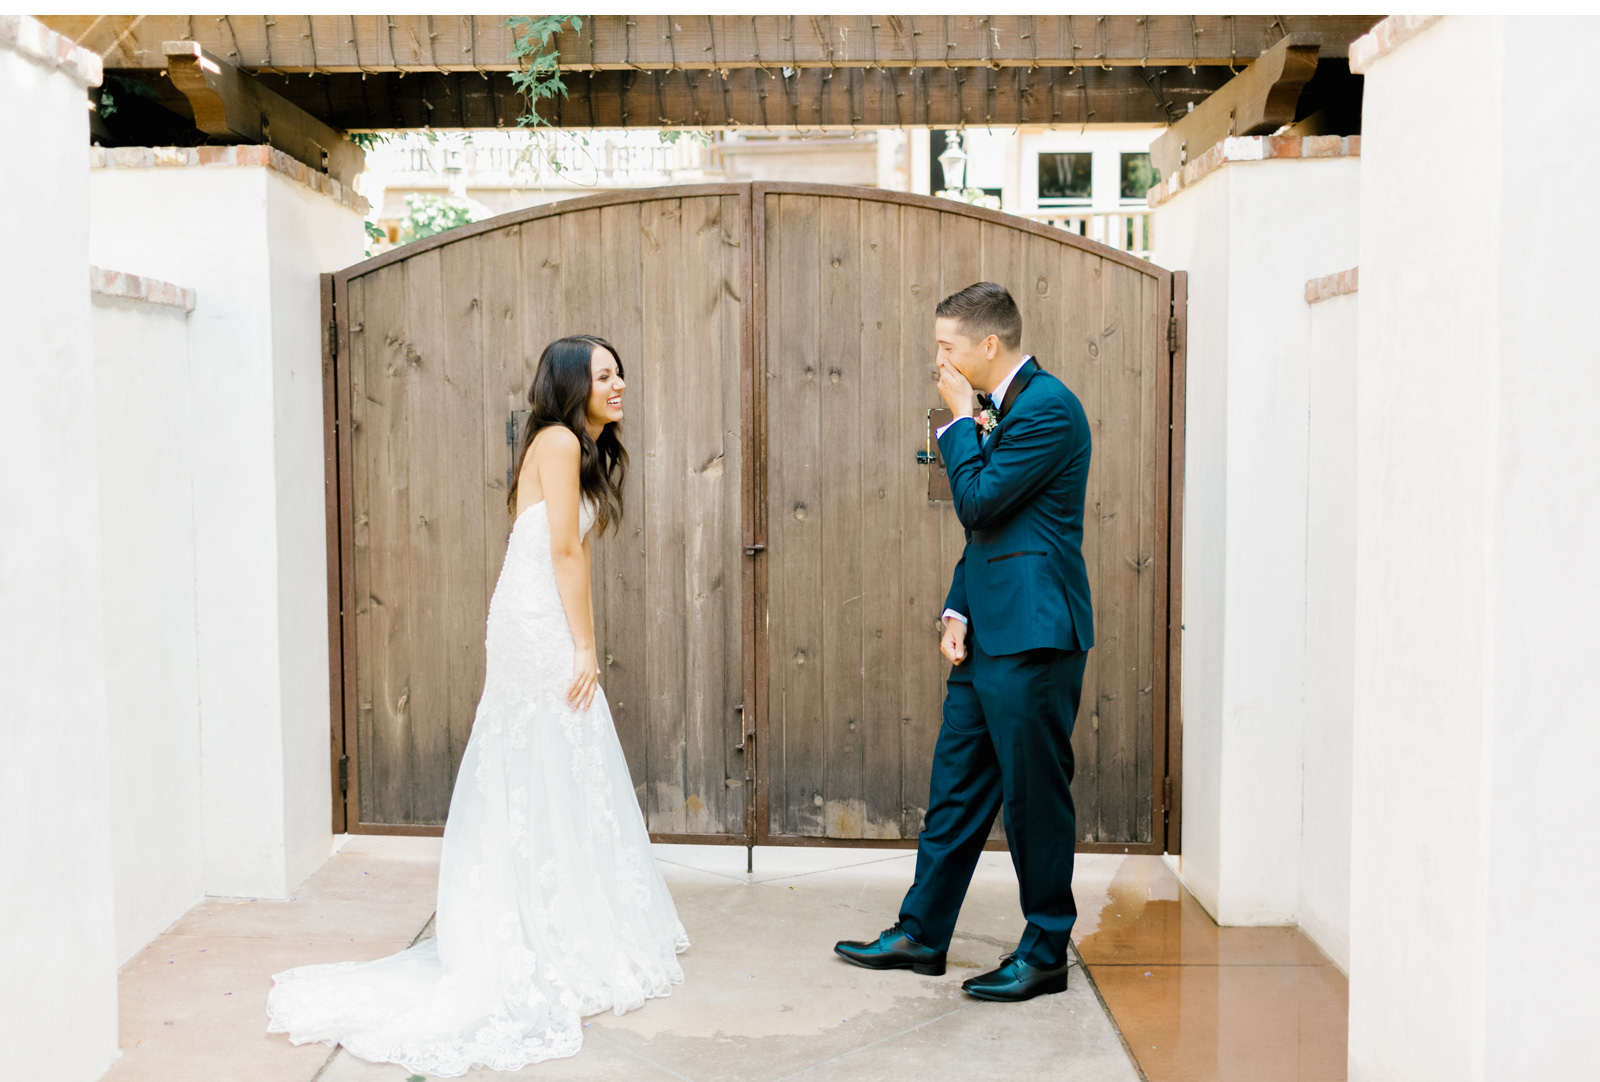 The-Villa-San-Juan-Capistrano-Wedding-Natalie-Schutt-Photography-Greylikes_02.jpg